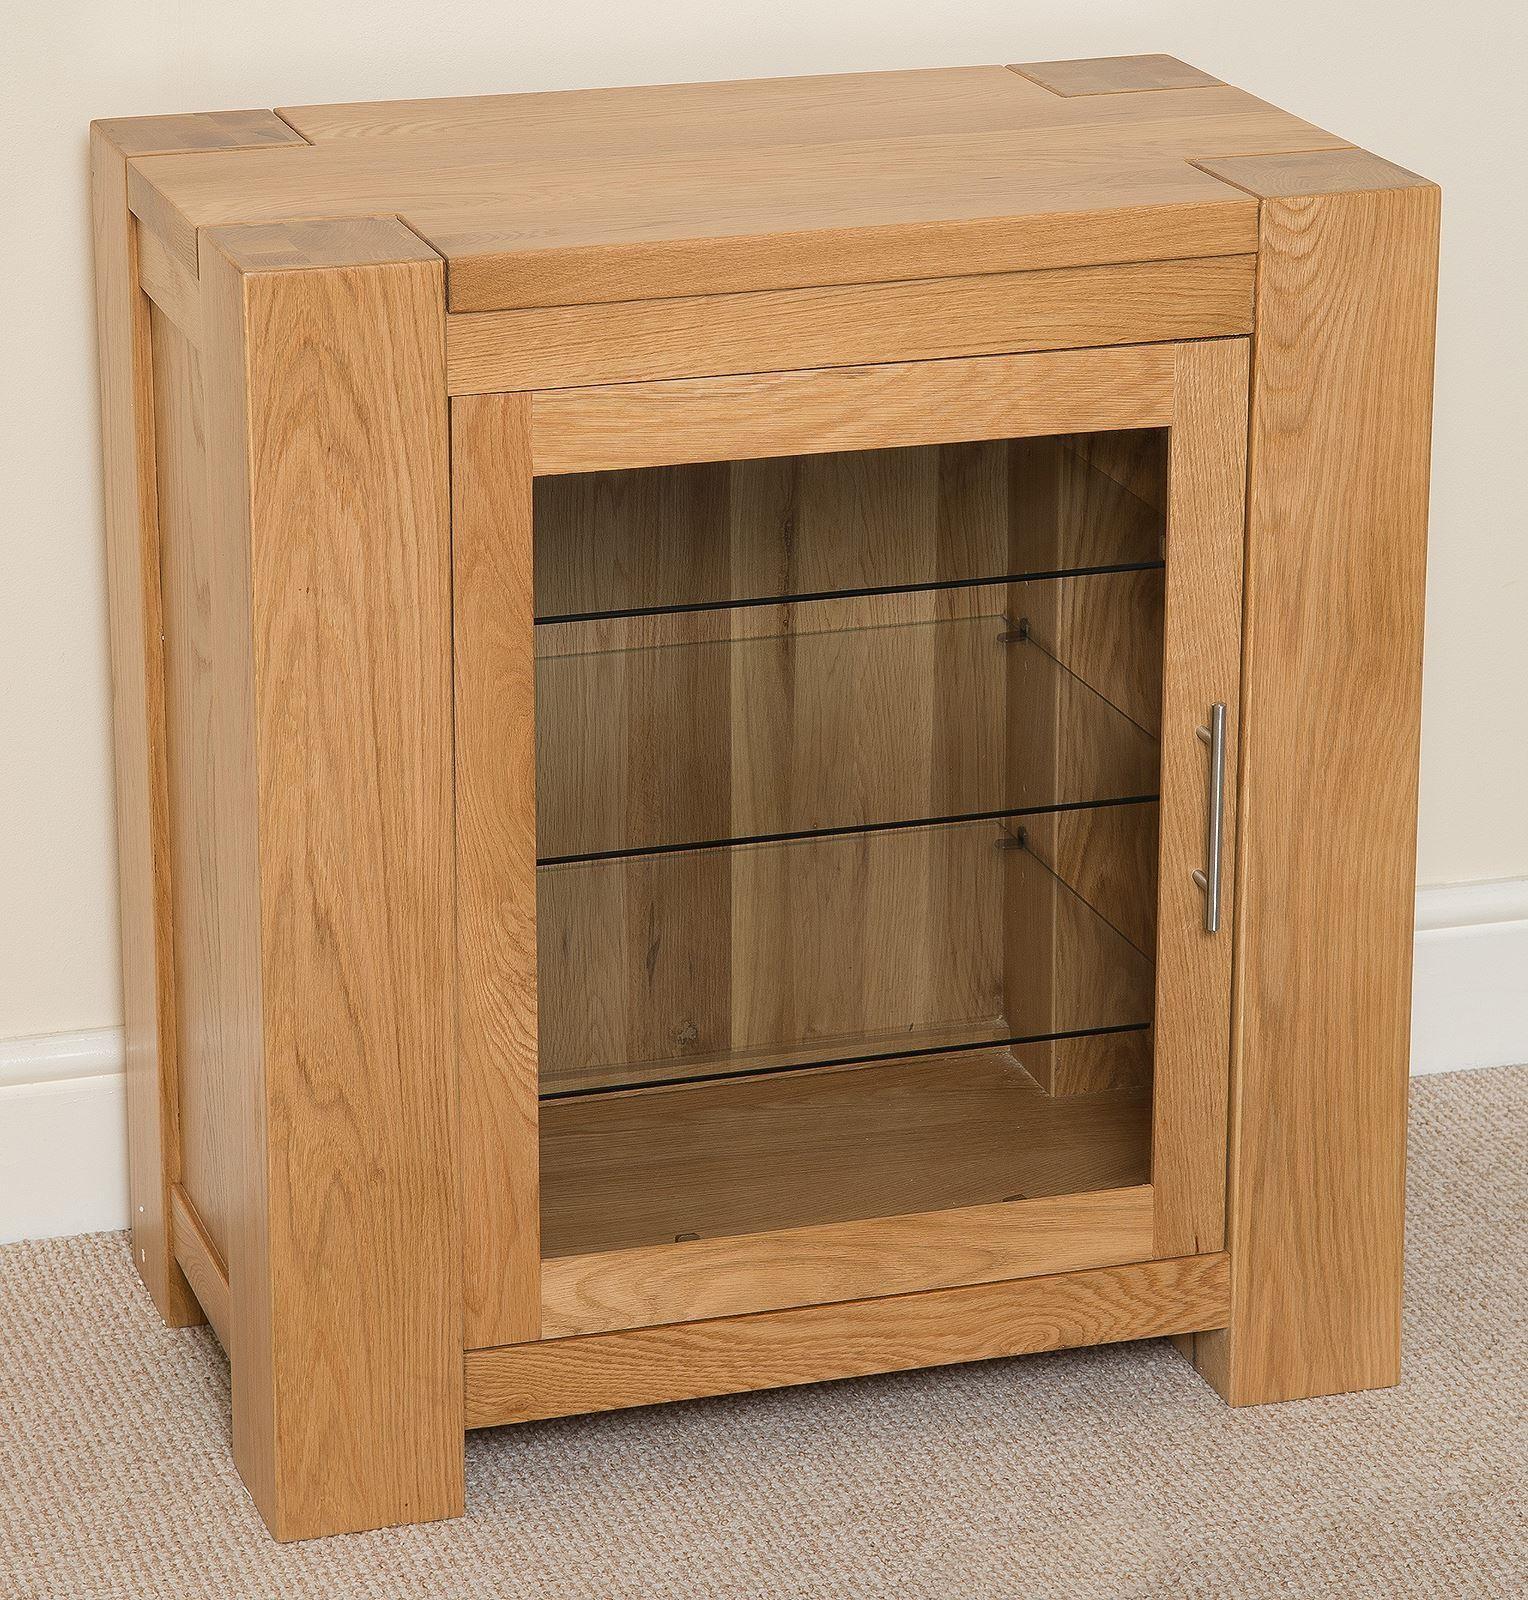 kuba solid oak hi fi media storage unit modern furniture. Black Bedroom Furniture Sets. Home Design Ideas